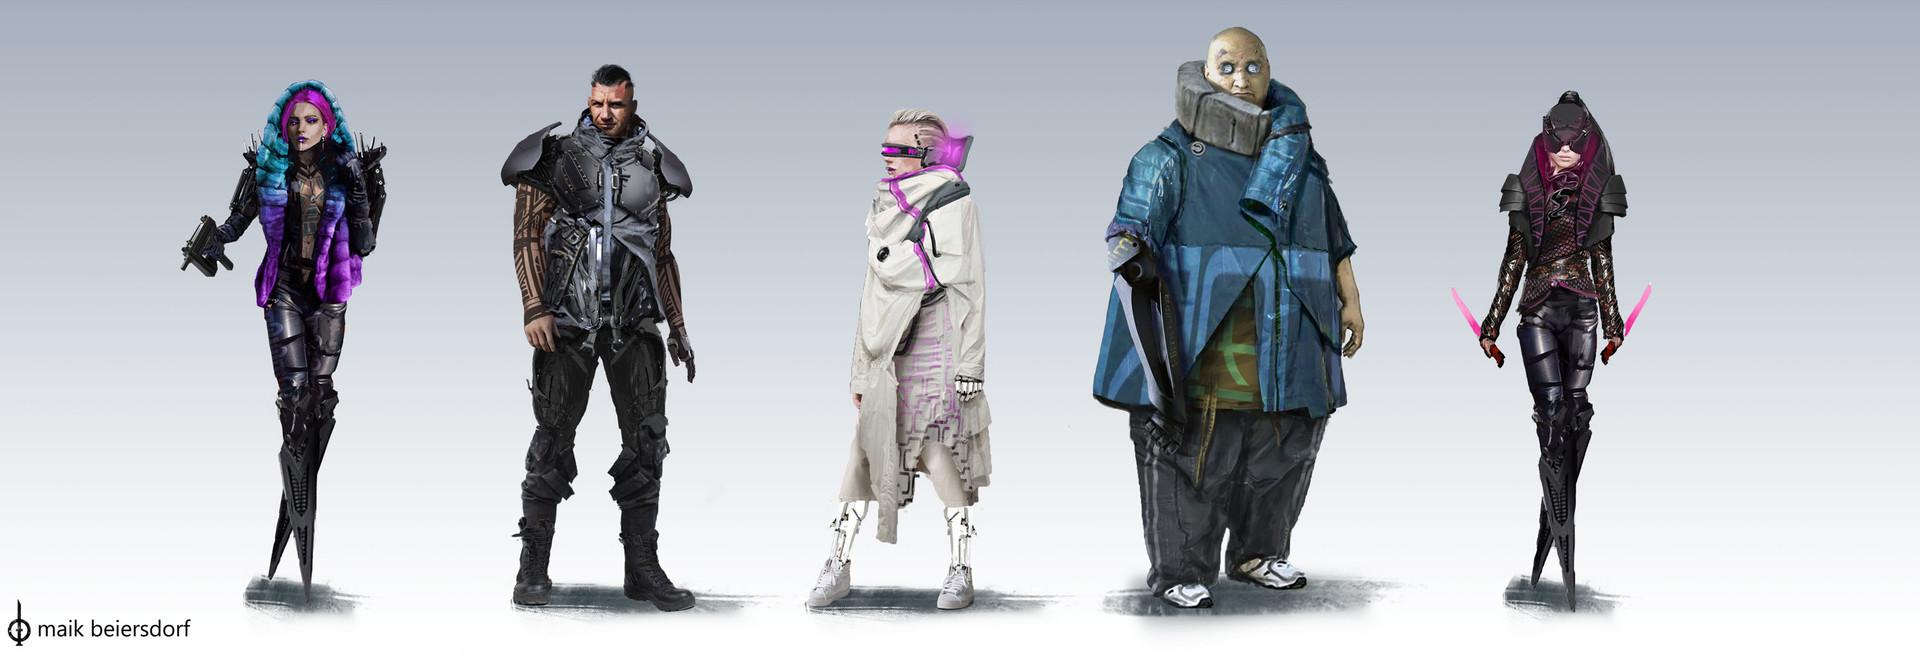 Maik beiersdorf character designs variation